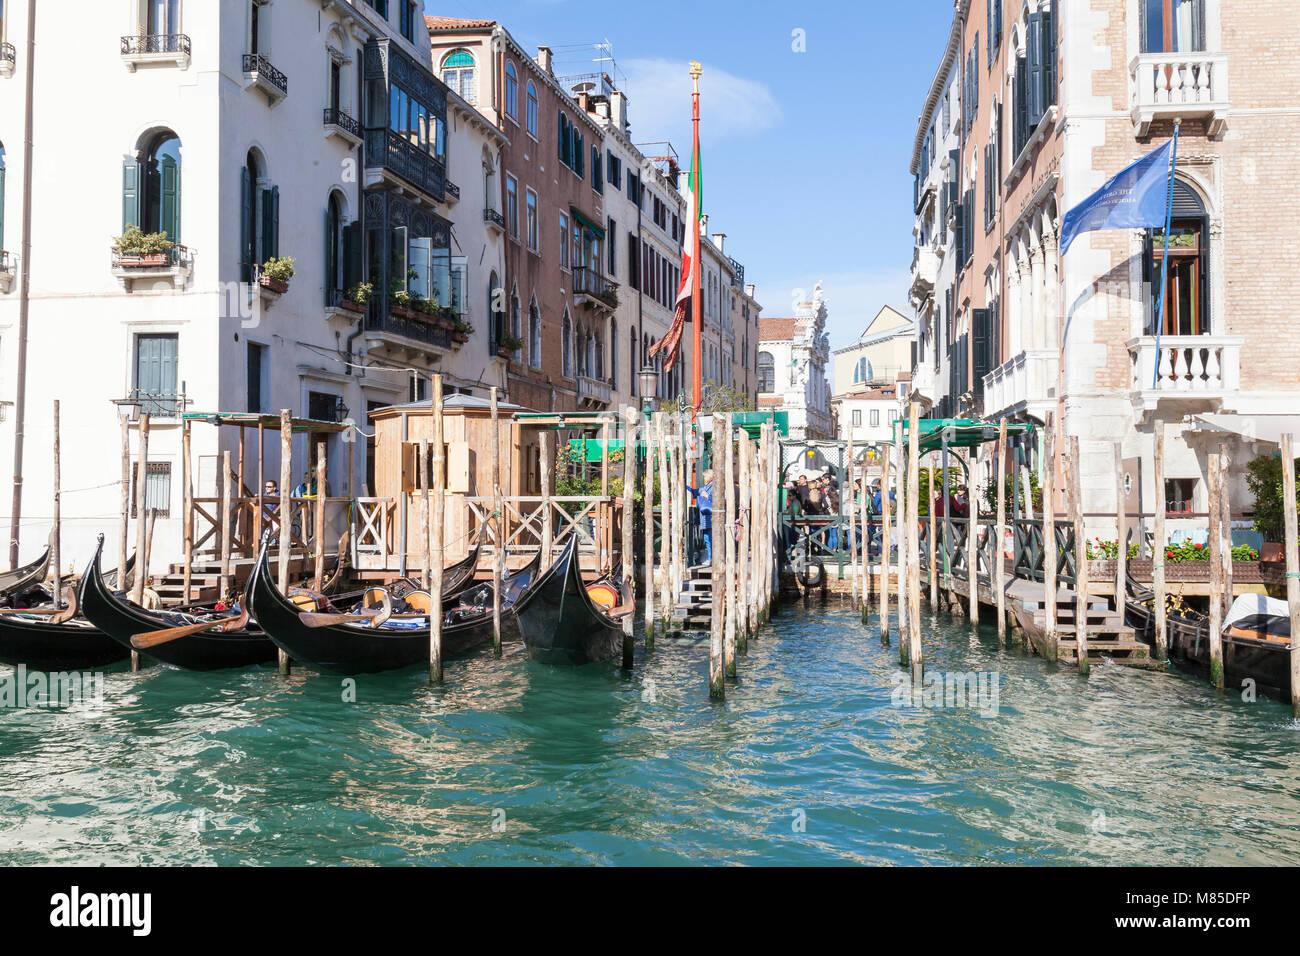 Santa Maria Giglio gondola station on the Grand Canal, San Marco, Venice,  Veneto, Italy with a view into Campiello - Stock Image